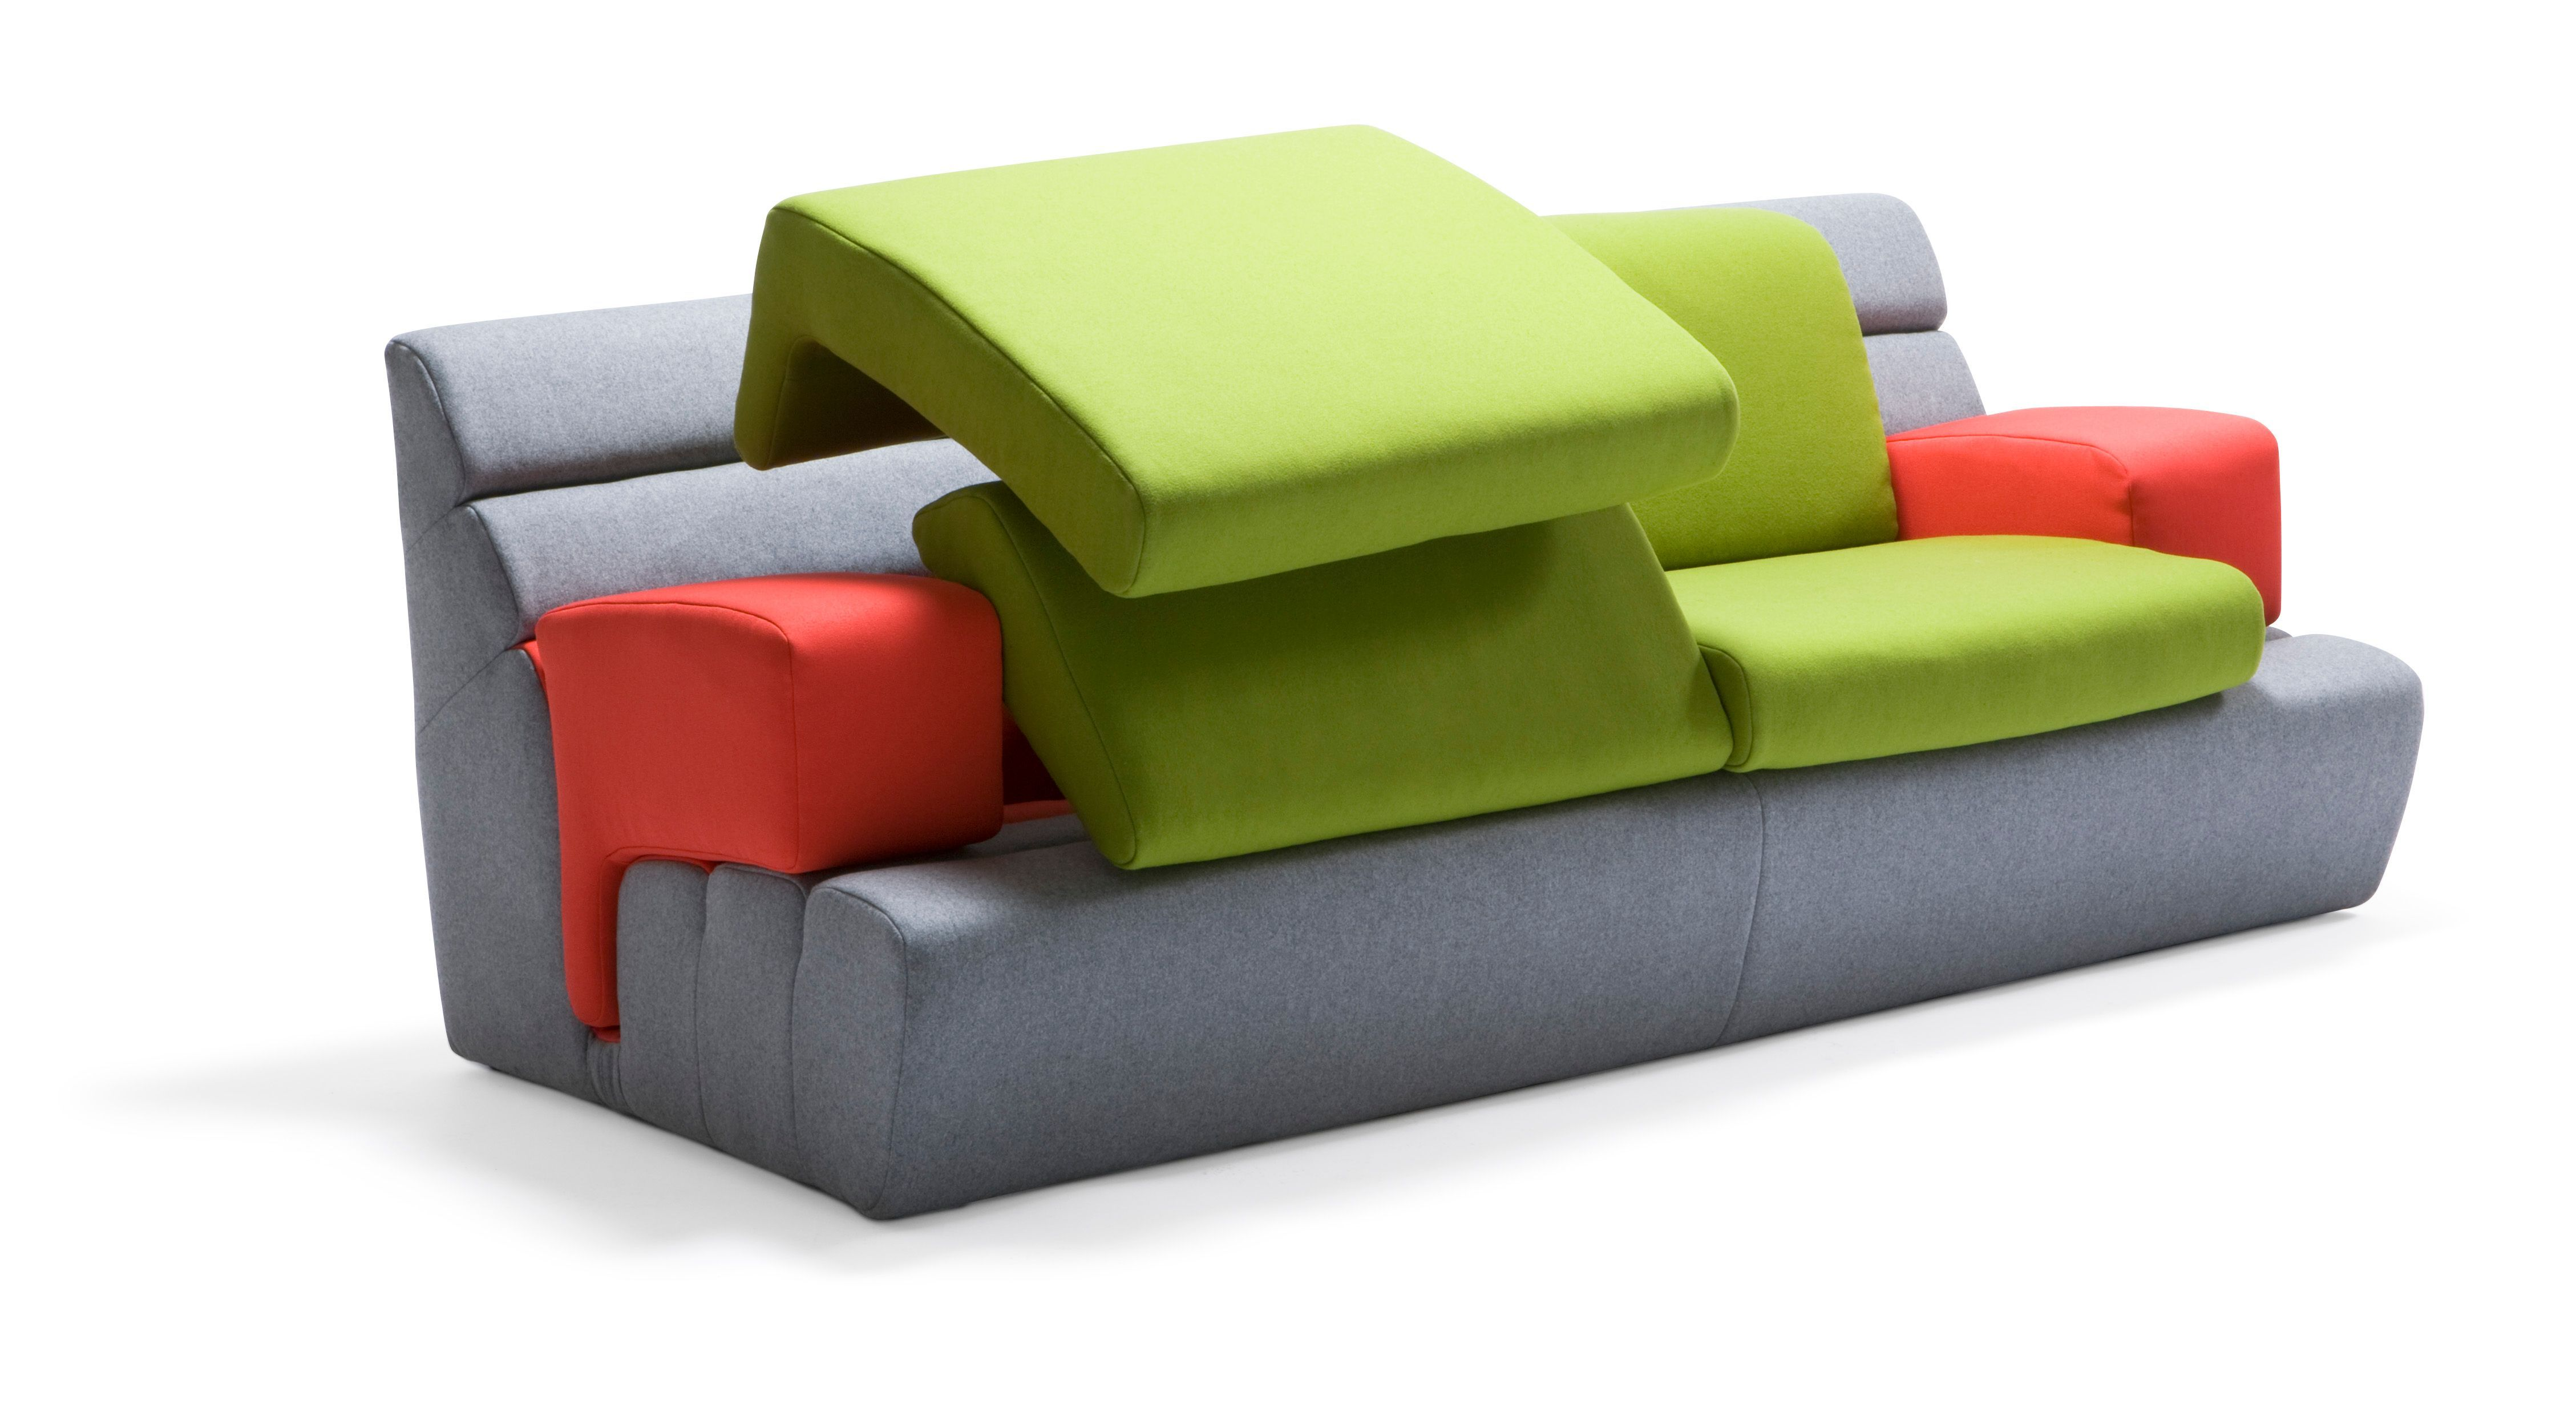 fermob ledru rollin with fermob ledru rollin. Black Bedroom Furniture Sets. Home Design Ideas